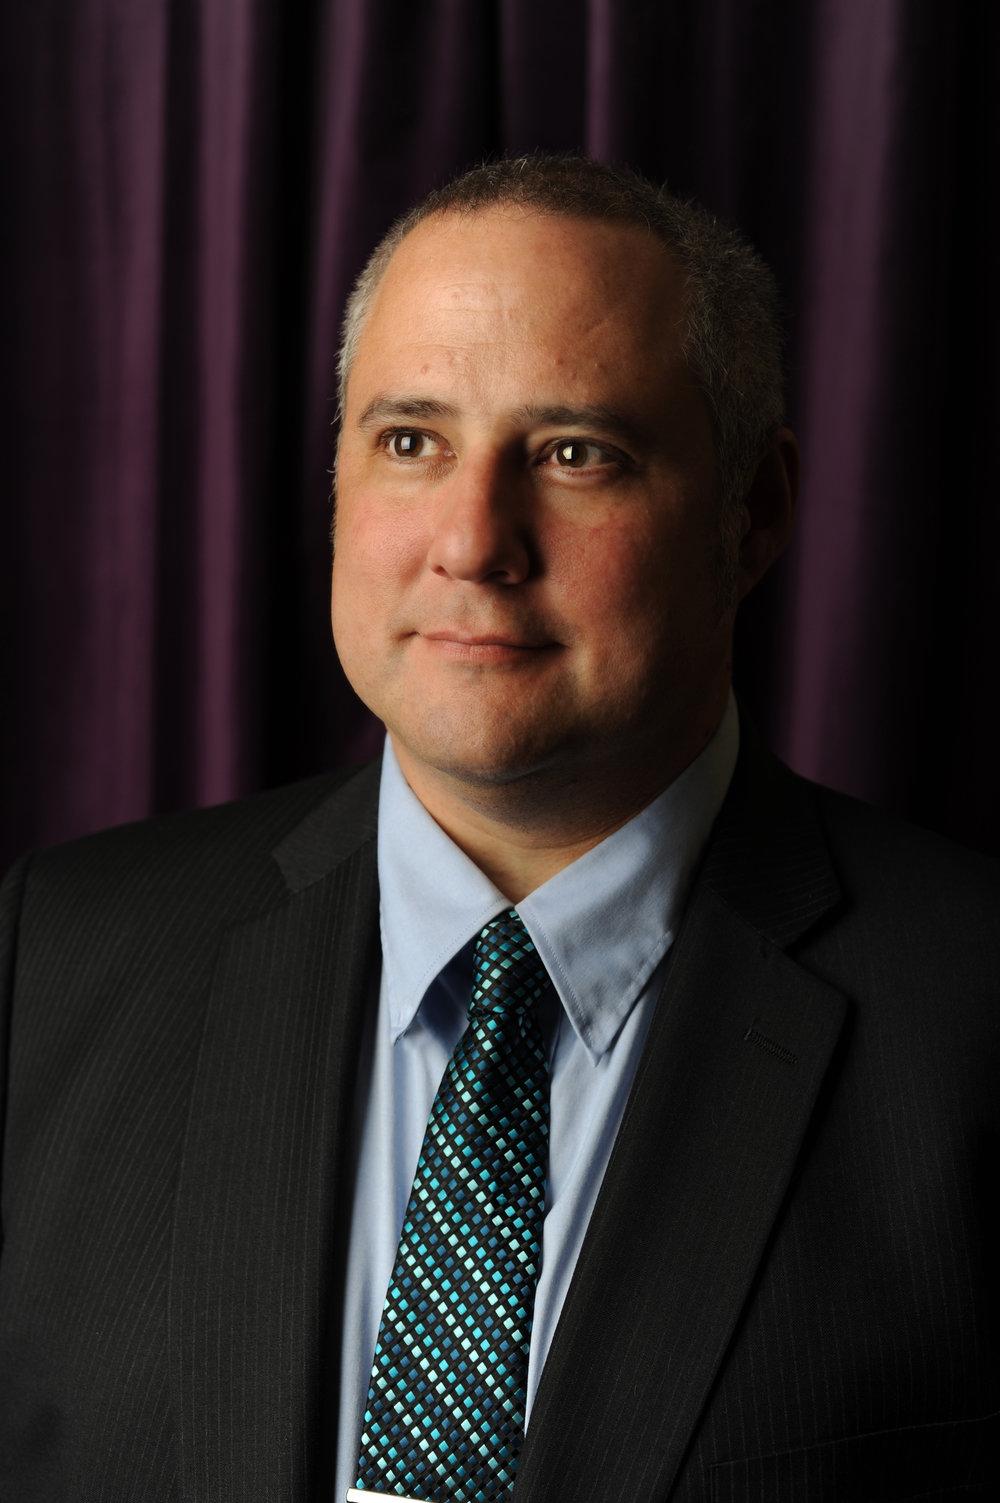 Jason C. Bailes